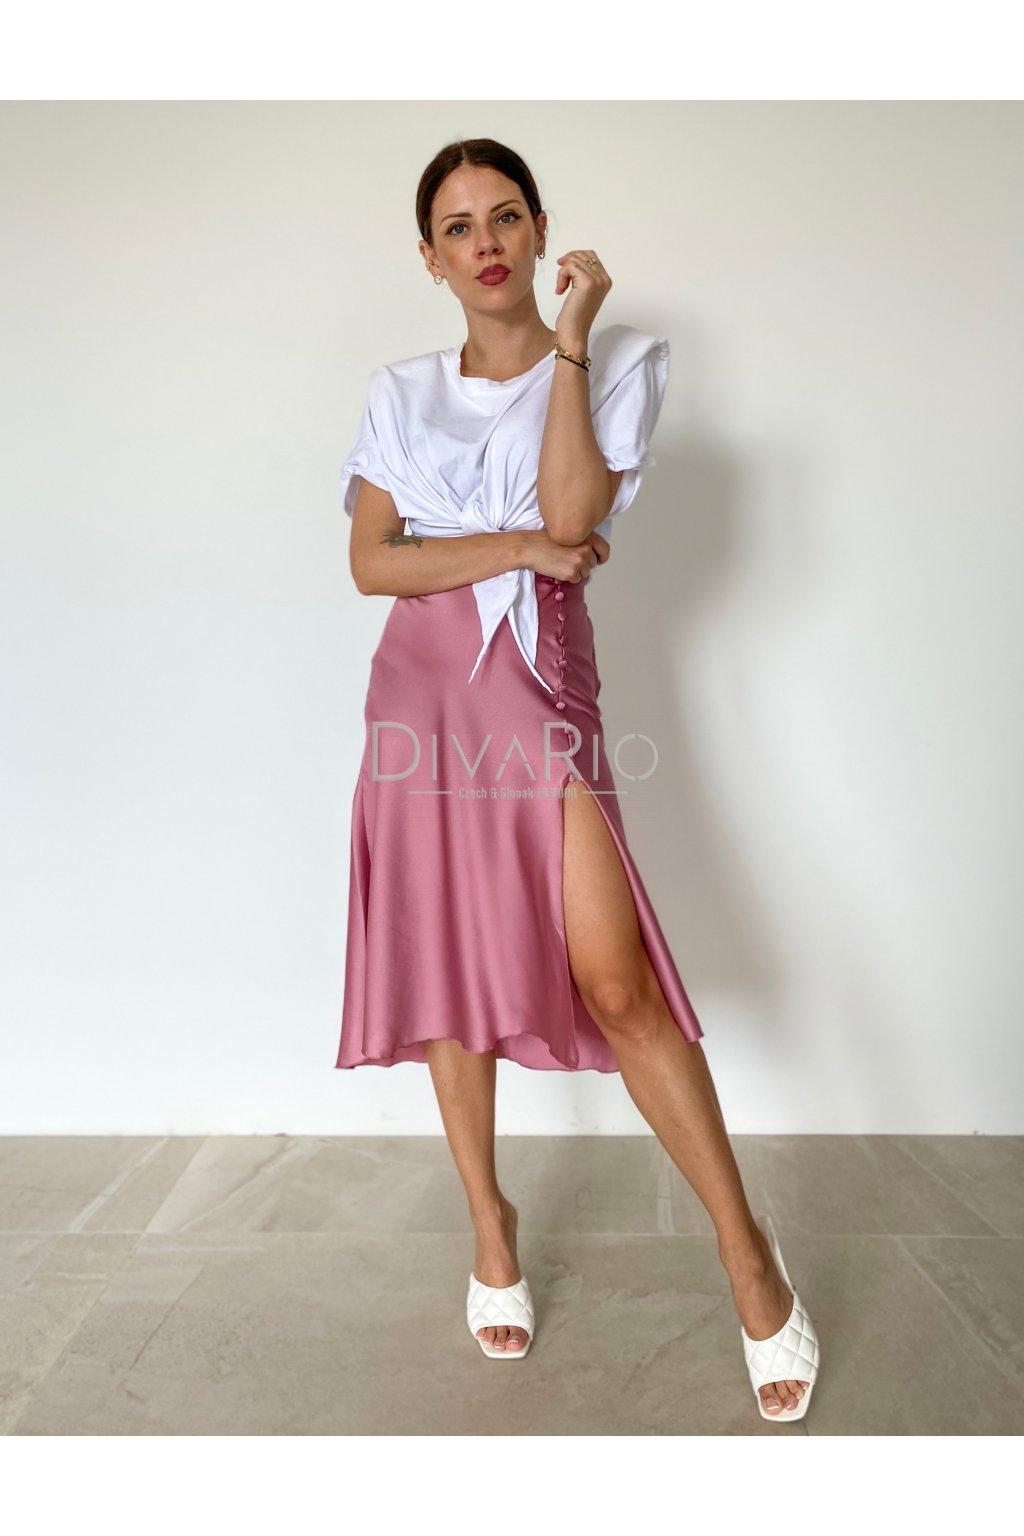 Satin Romantic Pink 3601